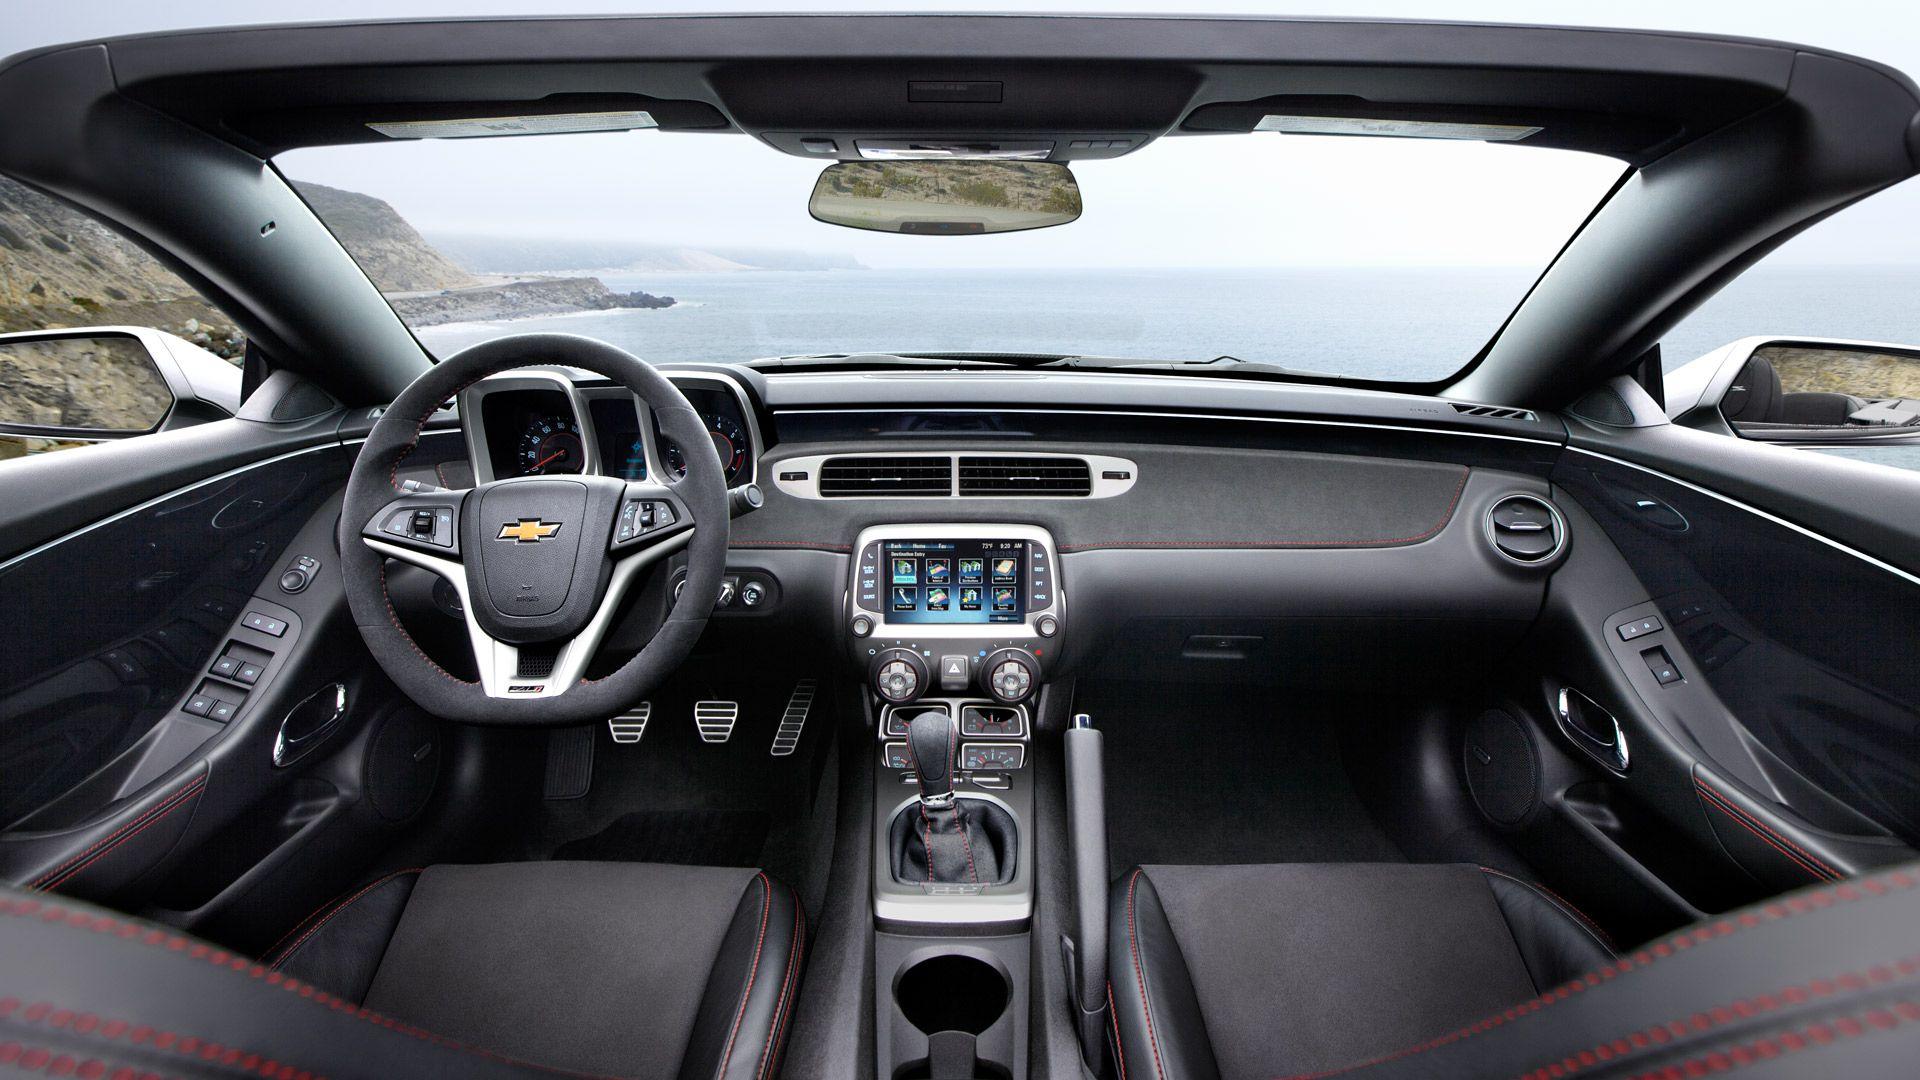 2013 Sports Cars Convertibles 2013 Chevy Camaro Zl1 Convertible Sports Car Interior Photos 2013 Camaro Interior Camaro Chevy Camaro